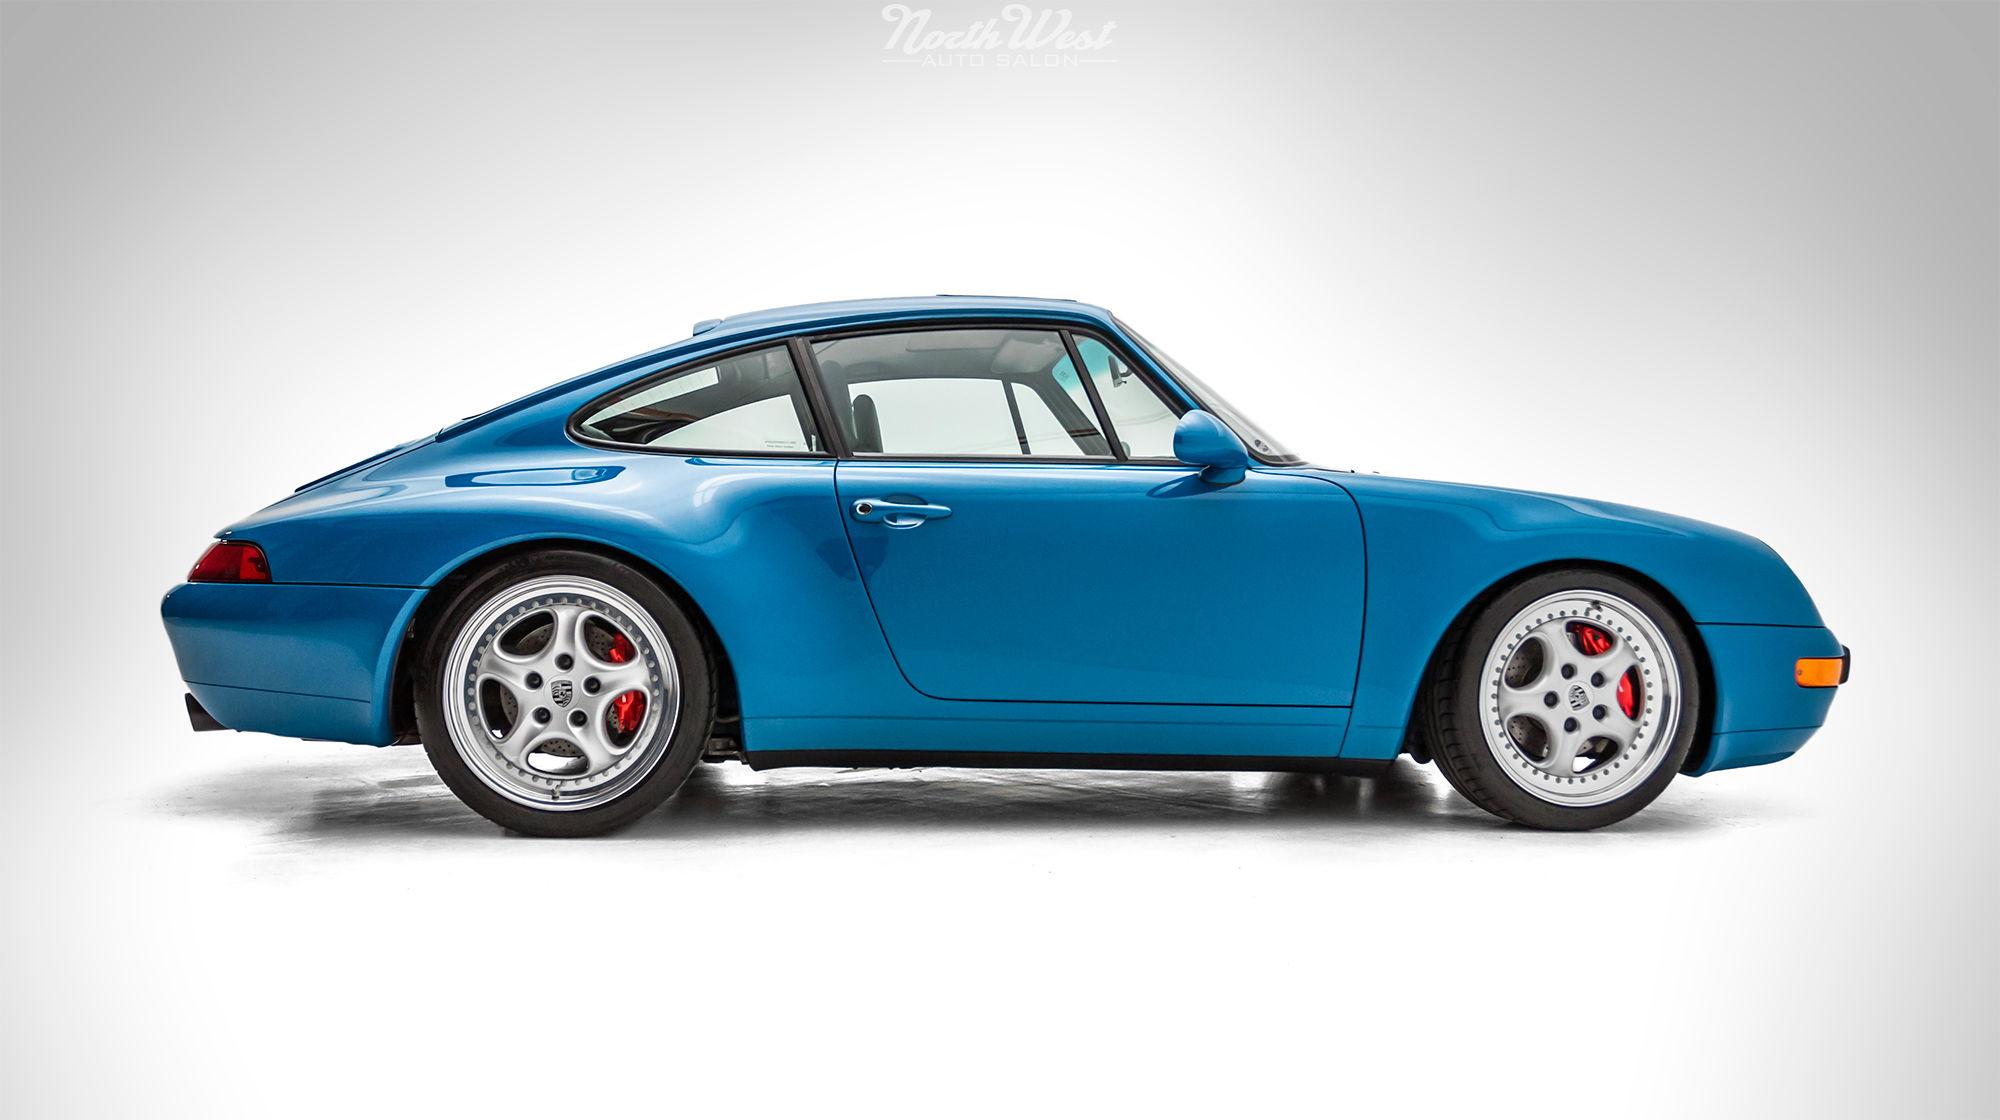 911 Colors - Page 4 - Rennlist - Porsche Discussion Forums on blue boxster, blue delorean, blue yenko, blue smart, blue infinity, blue yugo, blue bentley, blue fiat, blue noble, blue lincoln, blue prowler, blue murcielago, blue mitsubishi, blue isetta, blue 944 turbo, blue gto, blue suzuki, blue maserati, blue berlinetta, blue mini,